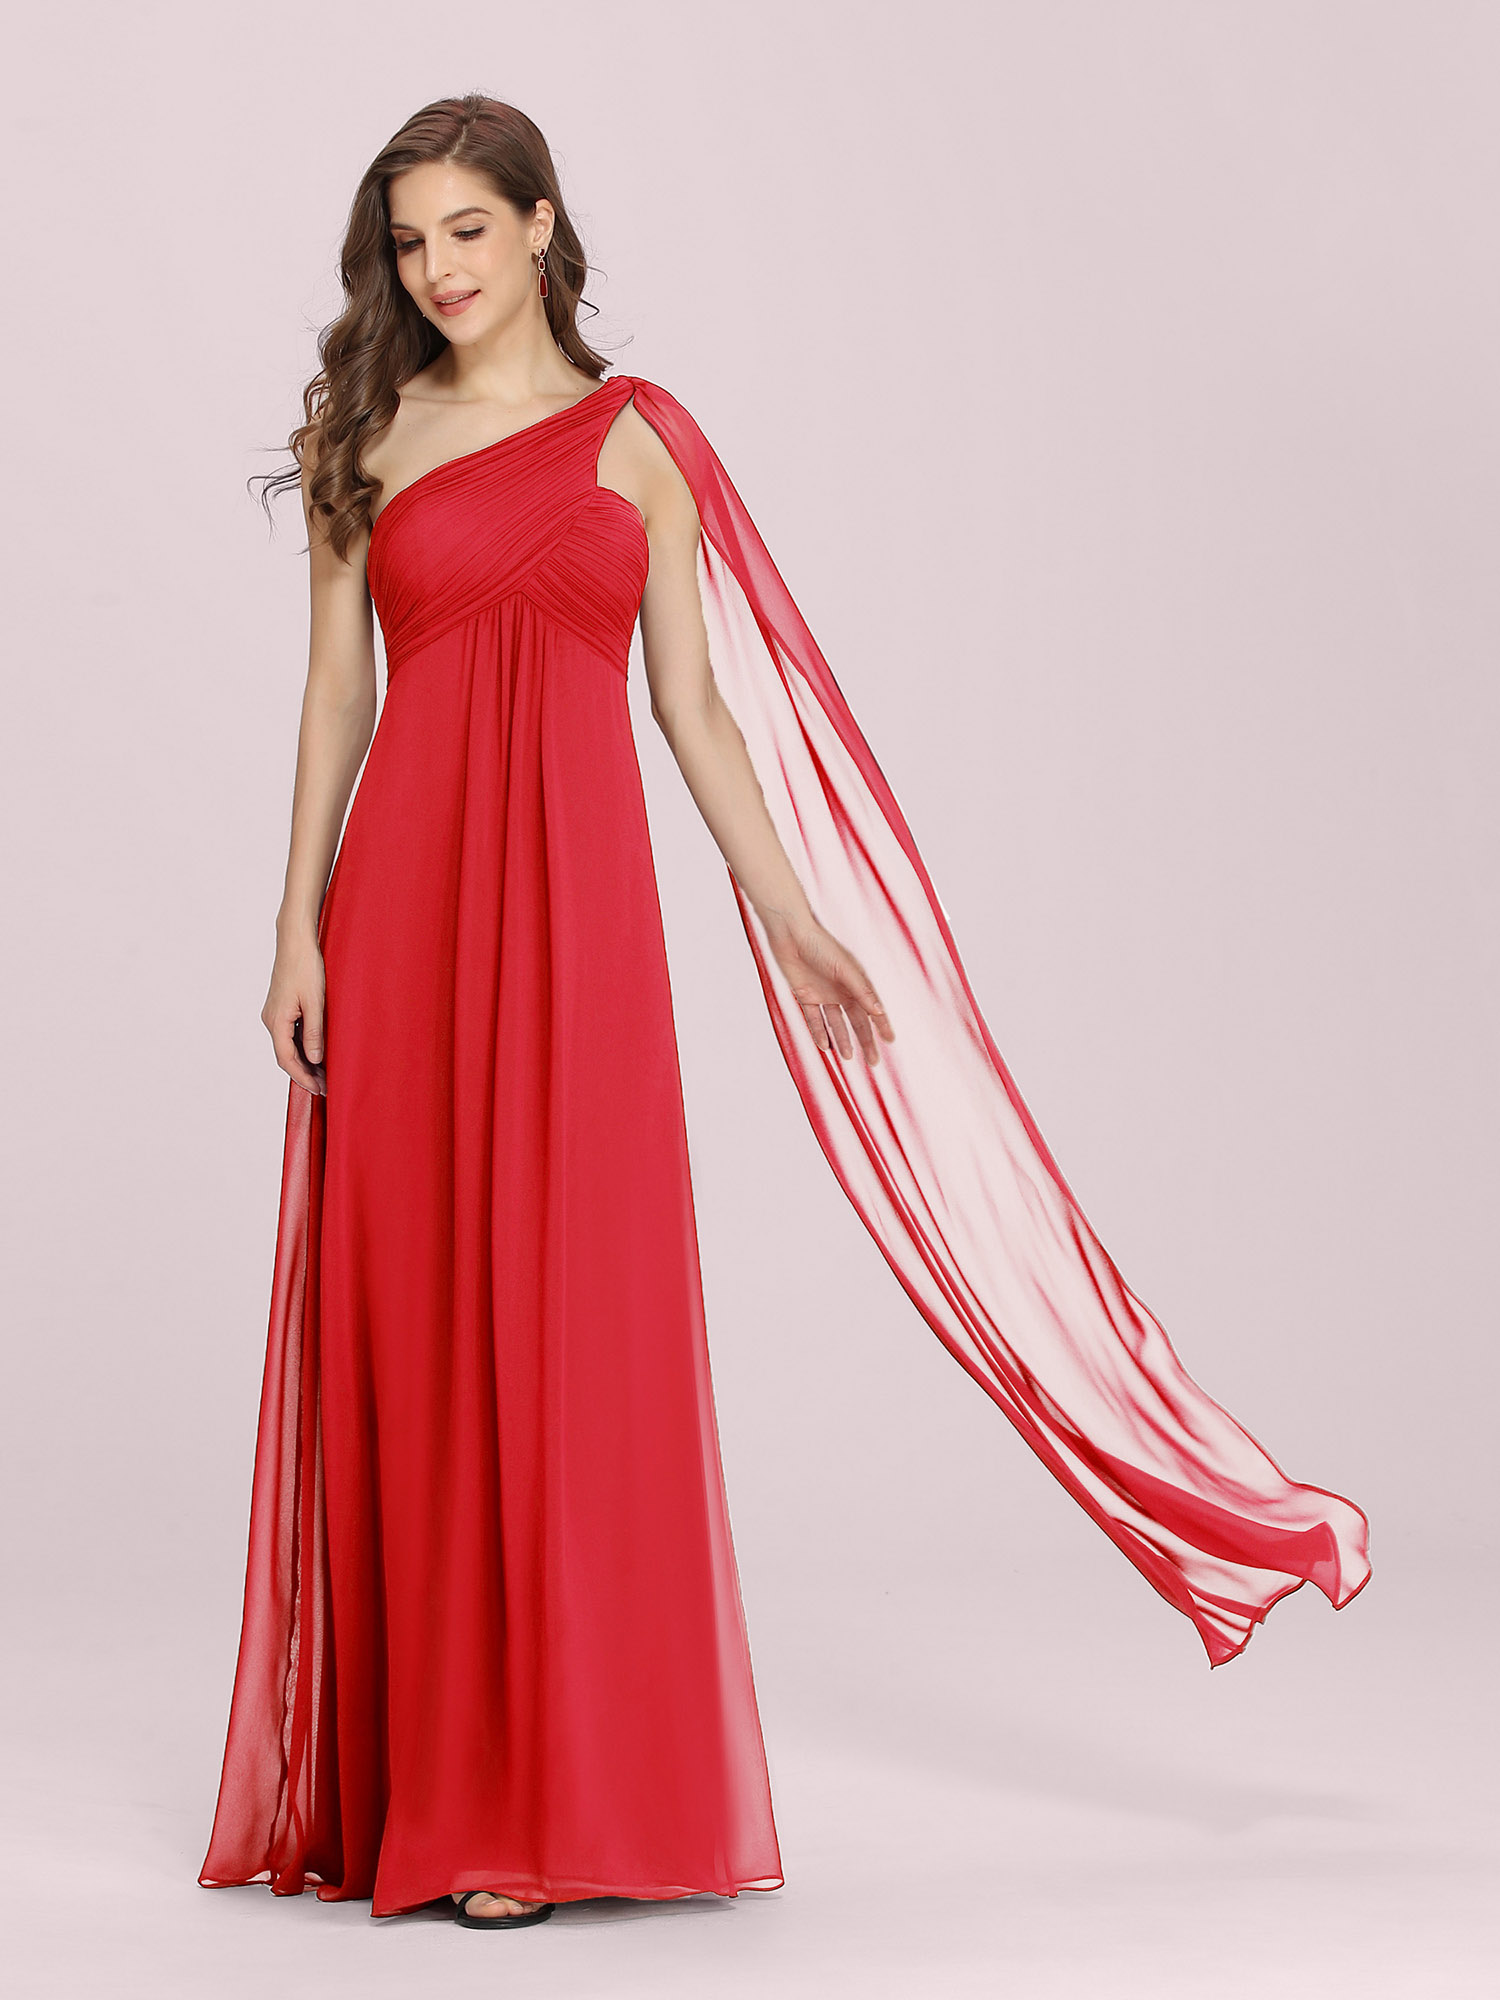 Ever-Pretty-Bridesmaid-Dresses-Chiffon-Ribbon-Long-Formal-Cocktail-Party-Dress thumbnail 31